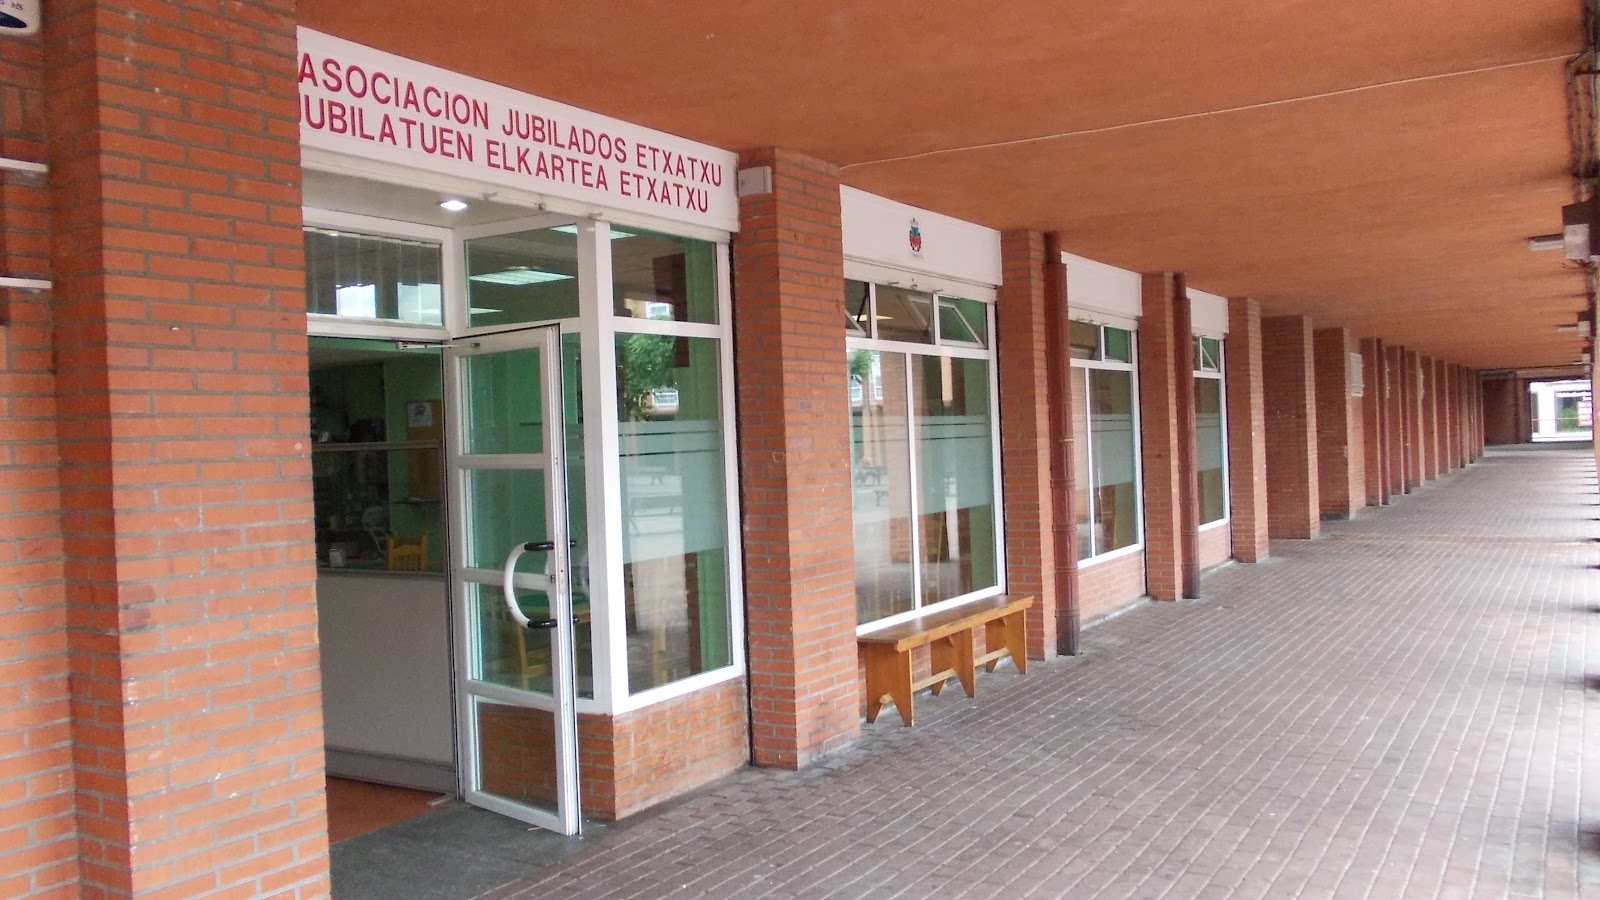 Local de jubilados de Etxatxu